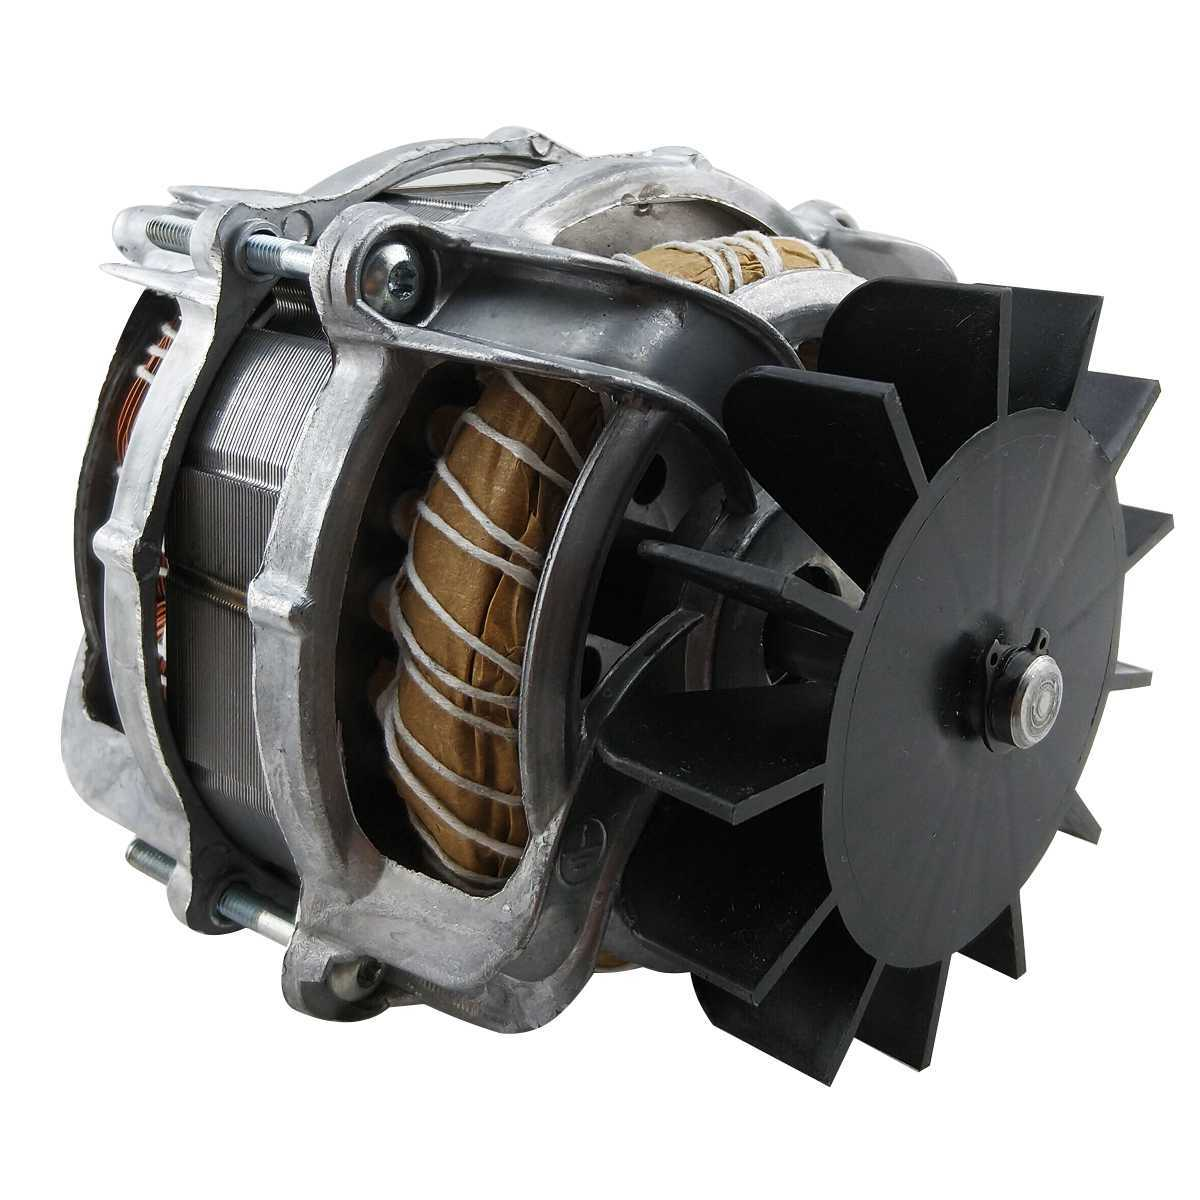 Motor pata tanquinho Suggar 220v Lavamax, lavamatic, Eco